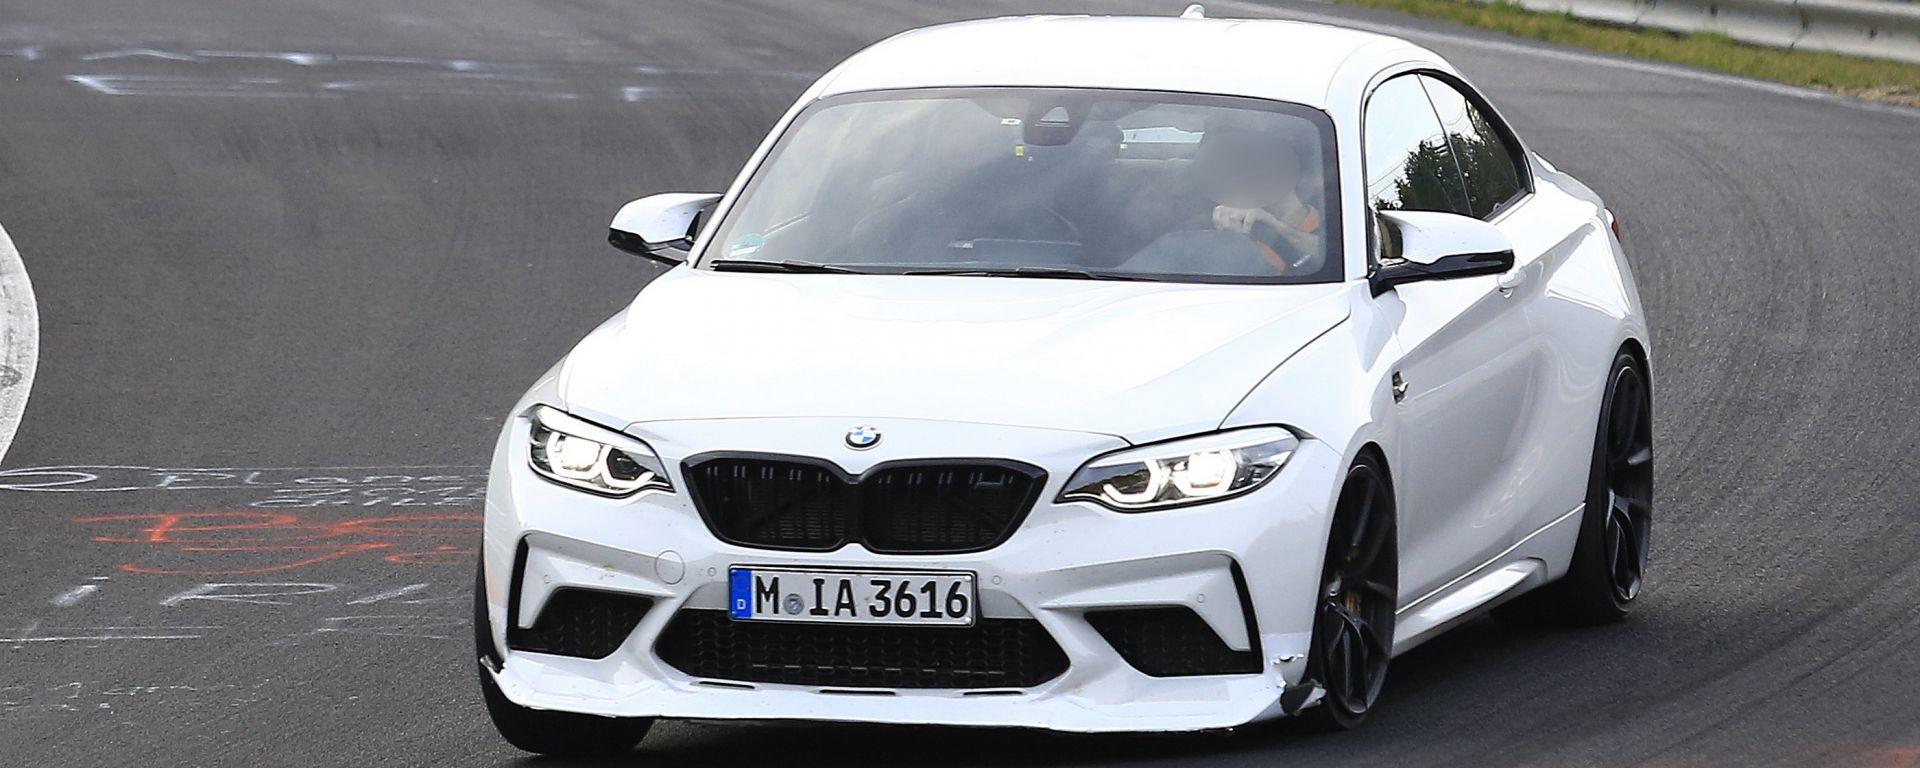 BMW M2 CS: vista frontale del muletto al Nurburgring